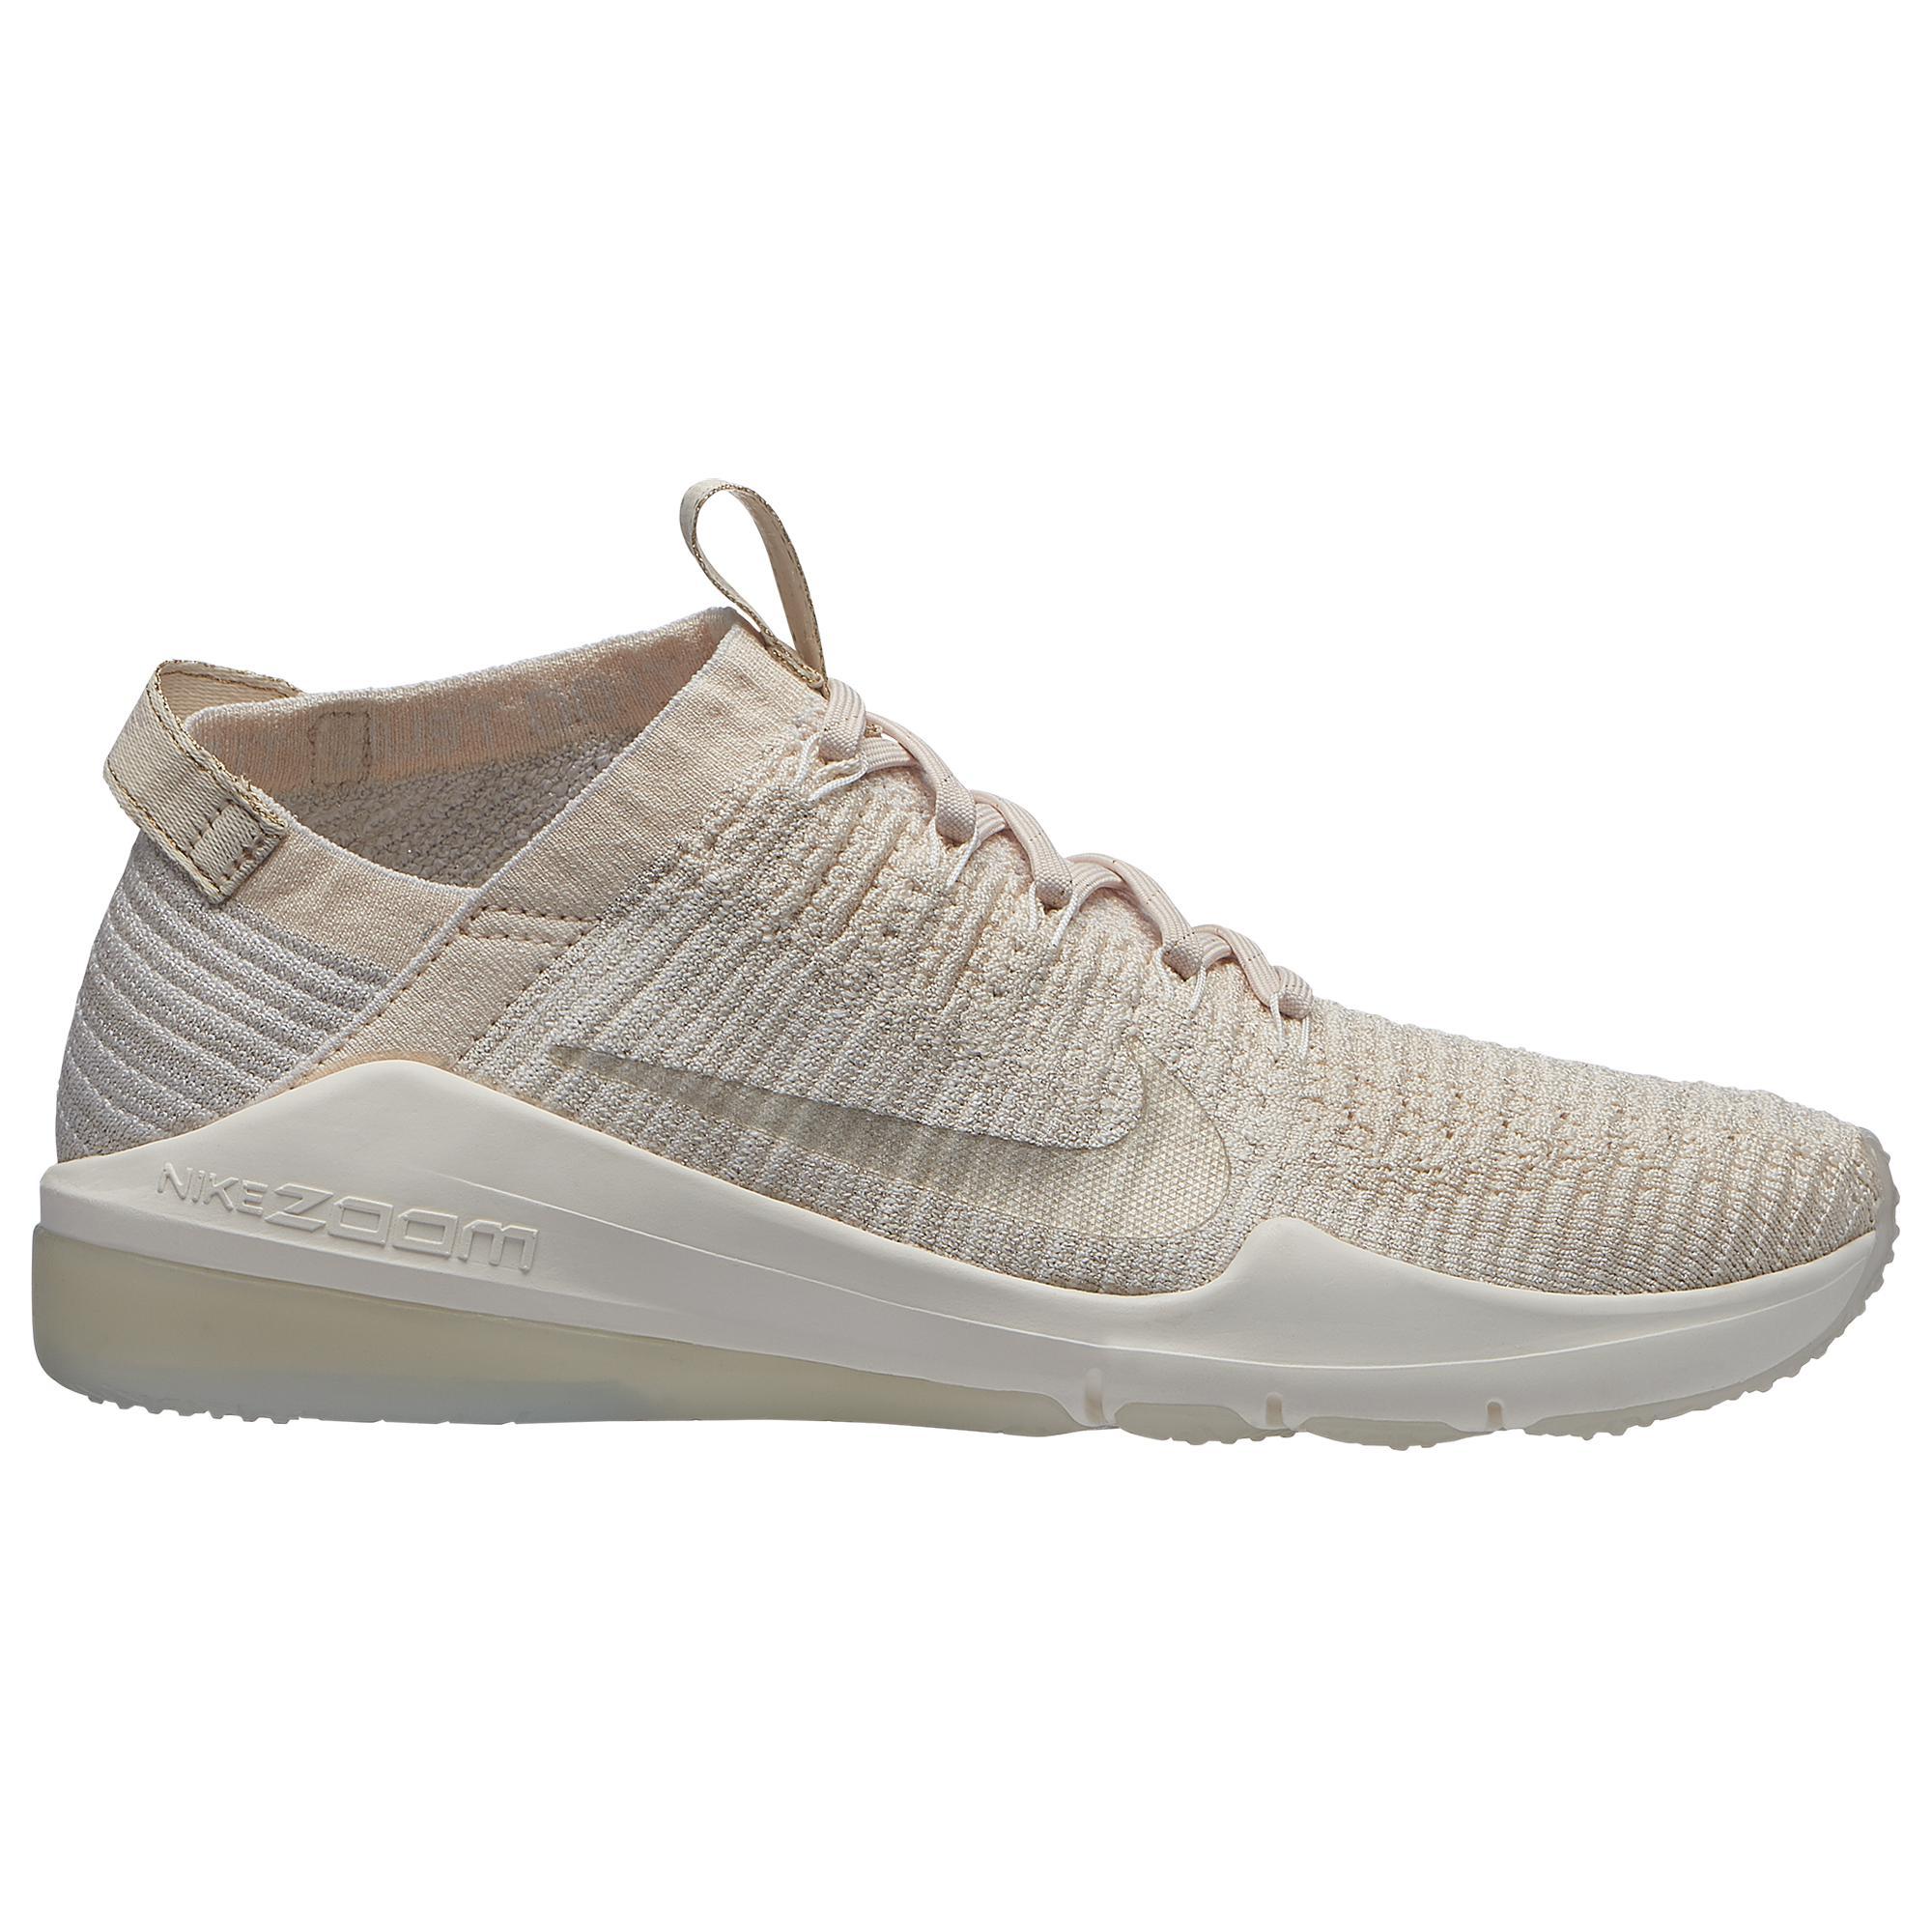 9c59803e051 Lyst - Nike Air Zoom Fearless Flyknit 2 in Gray